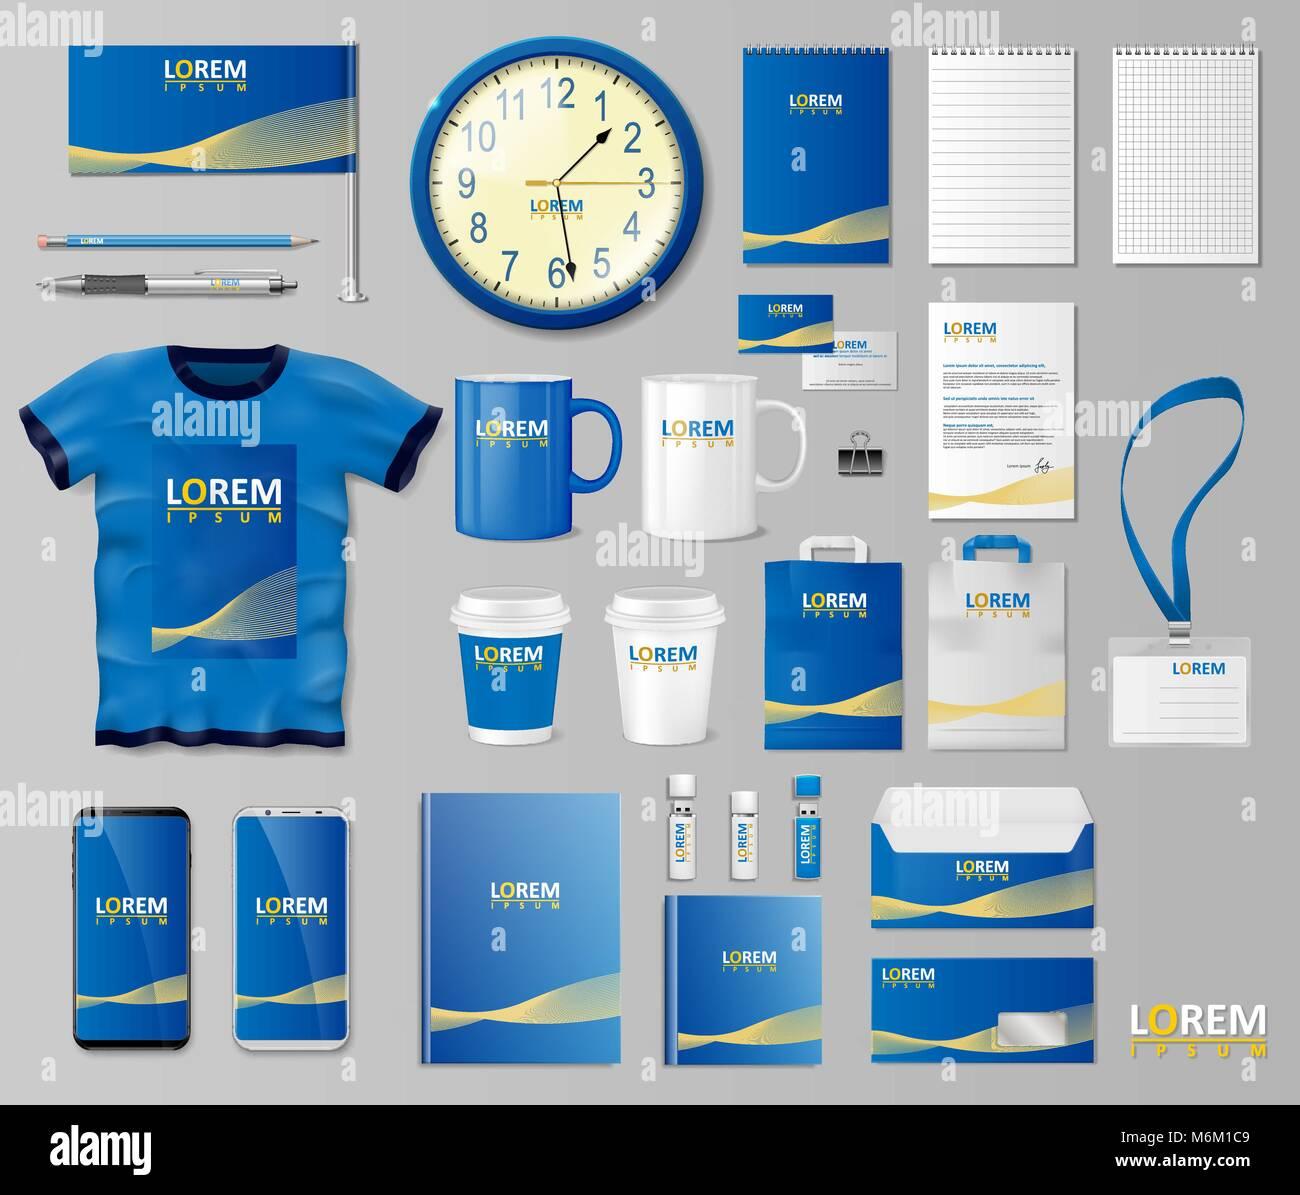 Translation House Corporate Stationery Design: Stationery Brand Stock Photos & Stationery Brand Stock